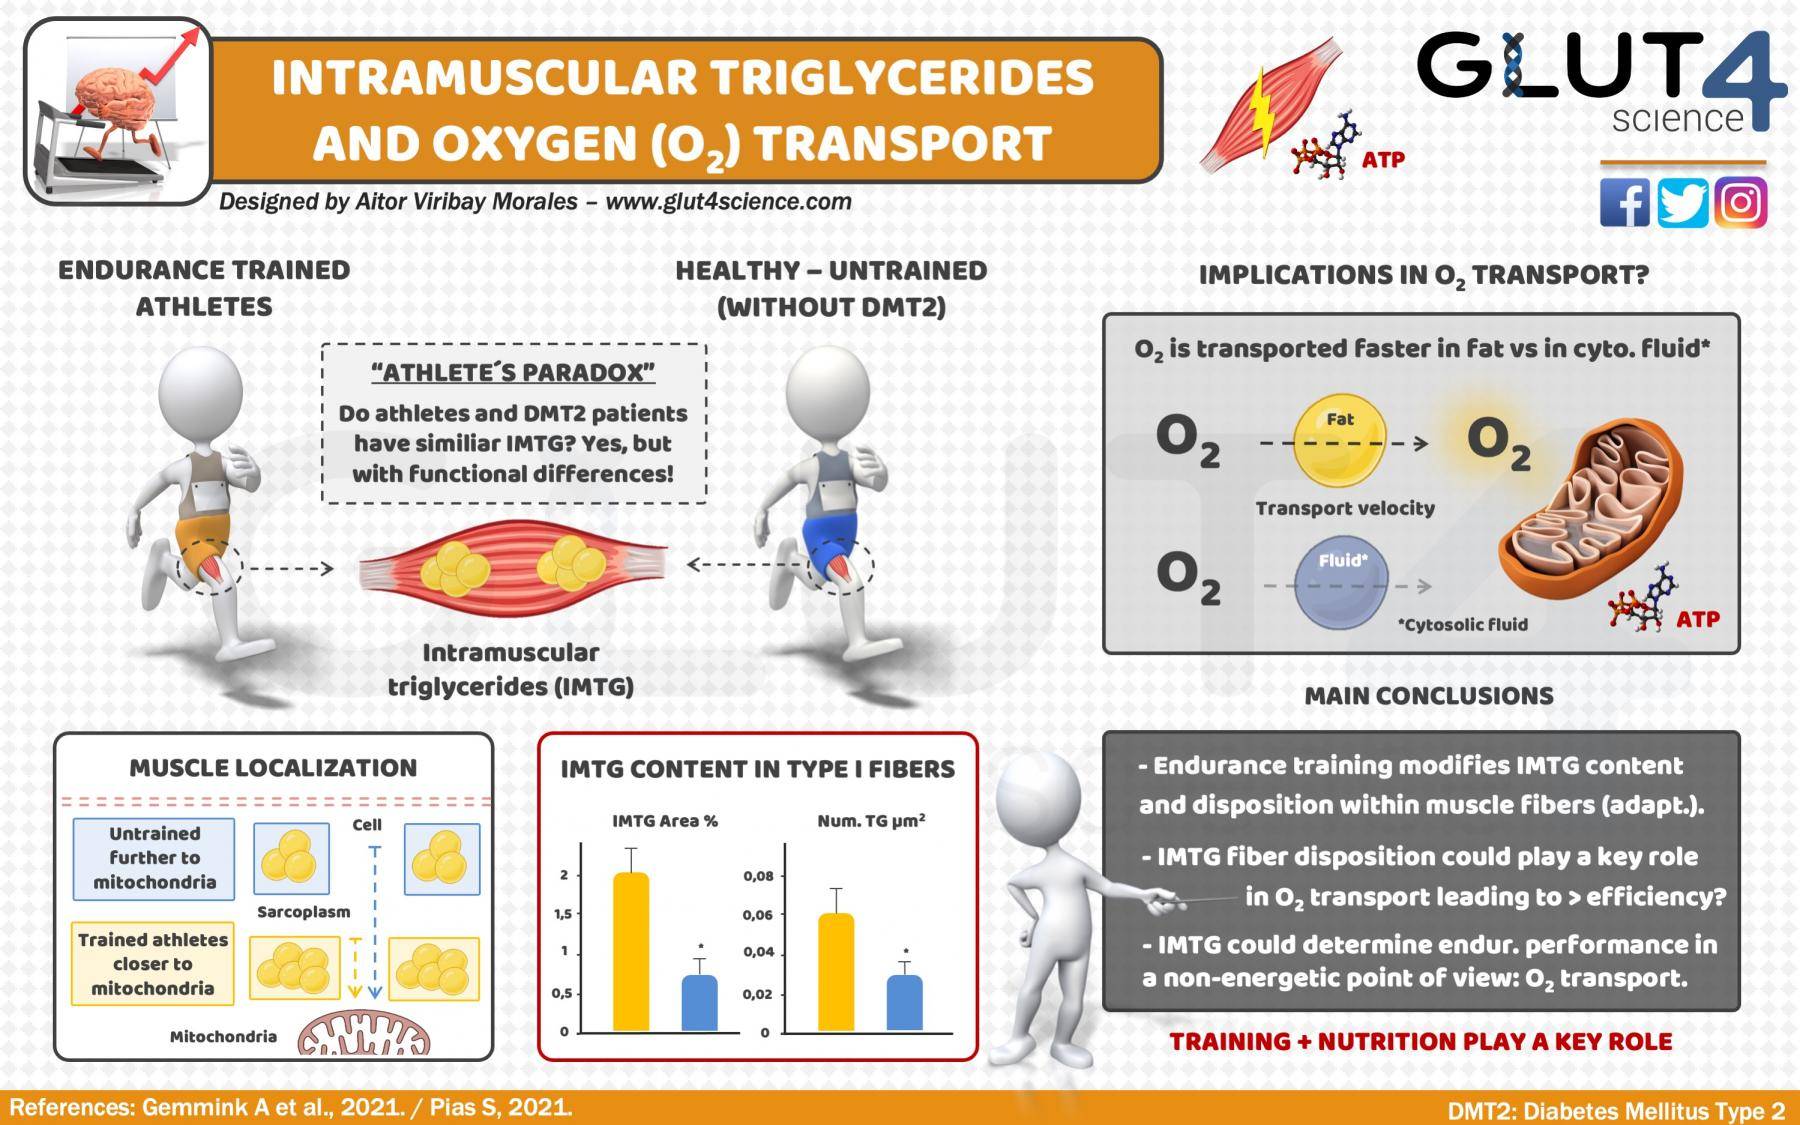 Intramuscular triglycerides, oxygen transport and efficiency